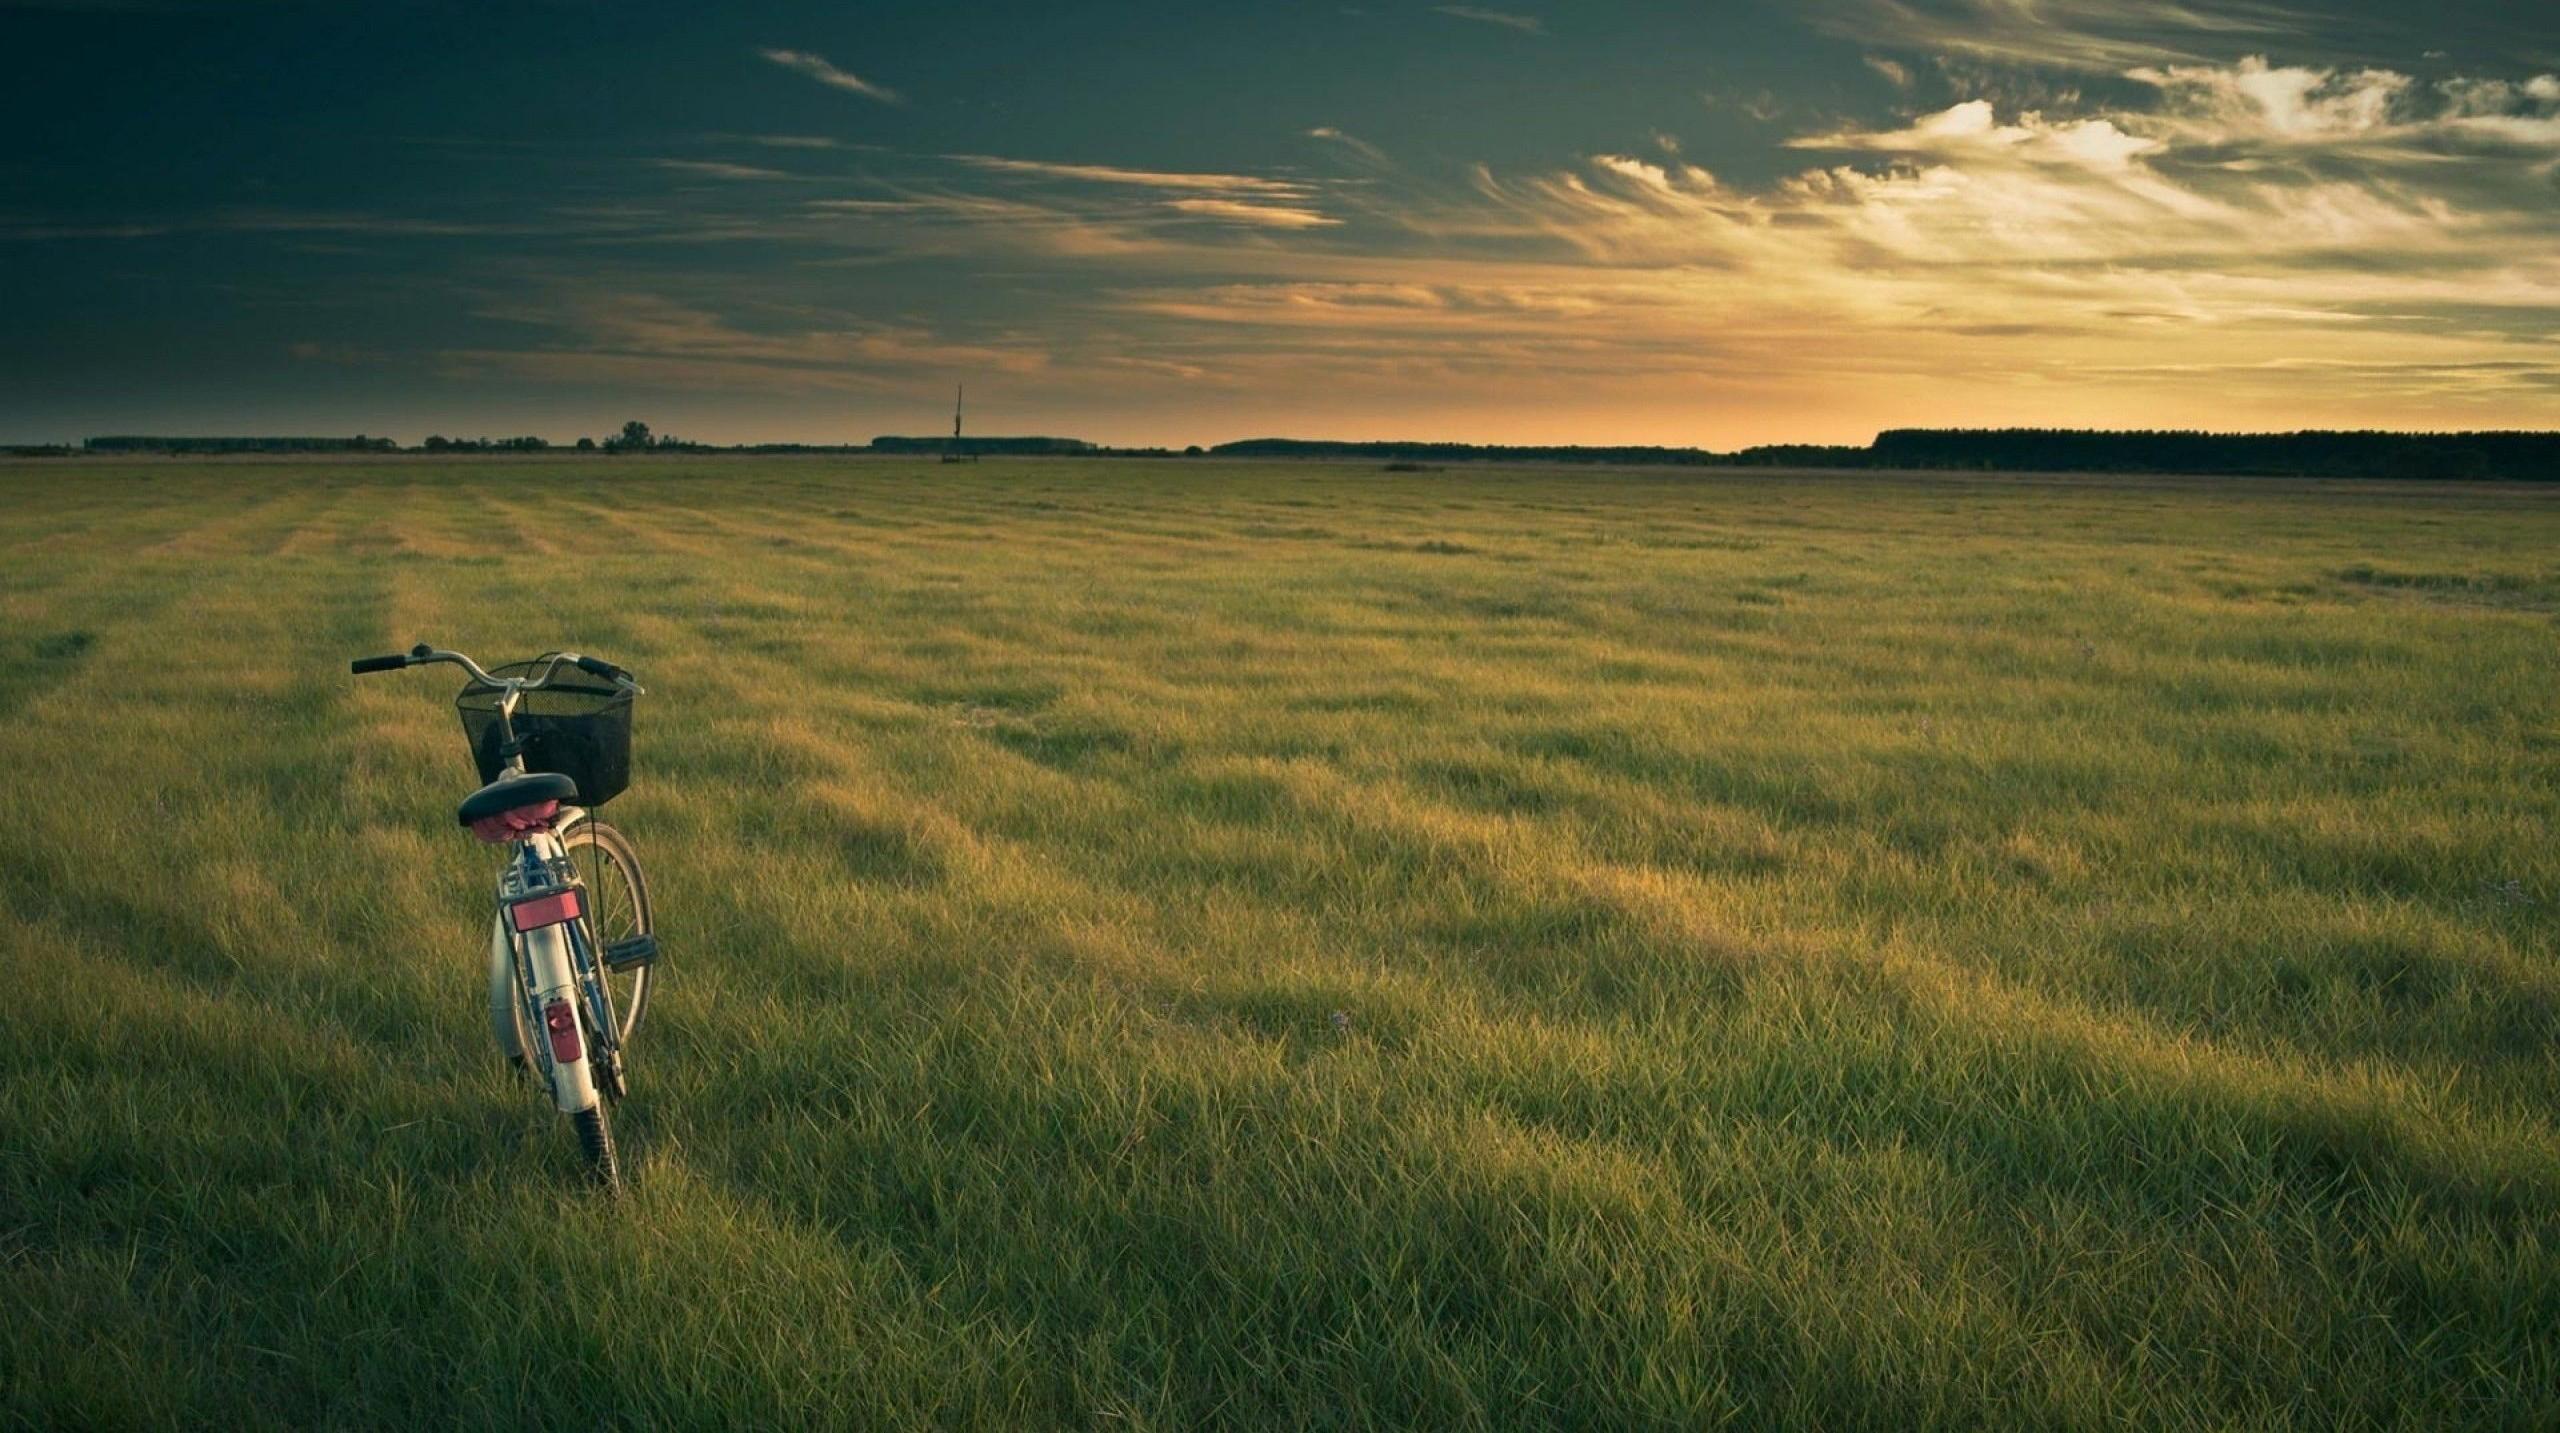 bicycle,-meadow,-sky-197263